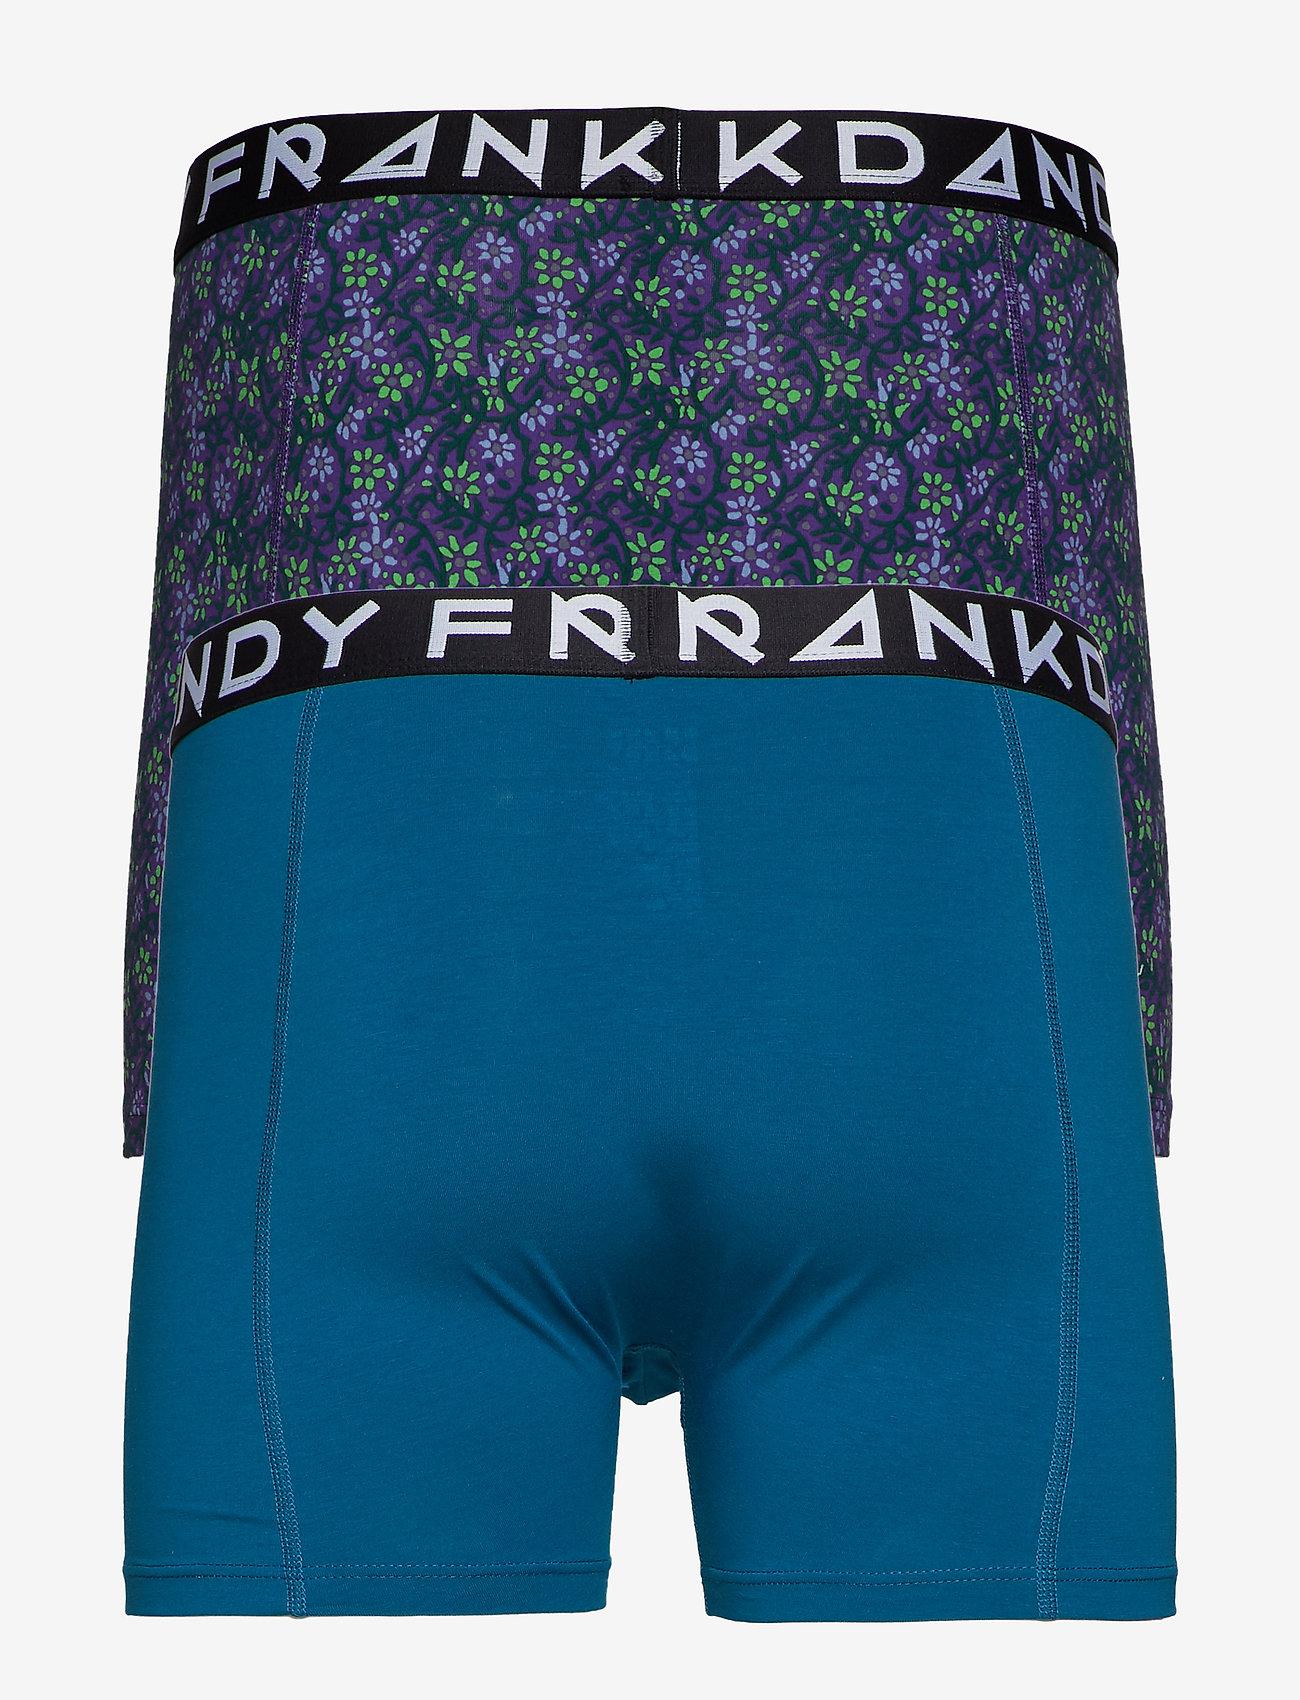 Frank Dandy - 2 Pack Blom Boxer - boxers - purple/petrol - 1